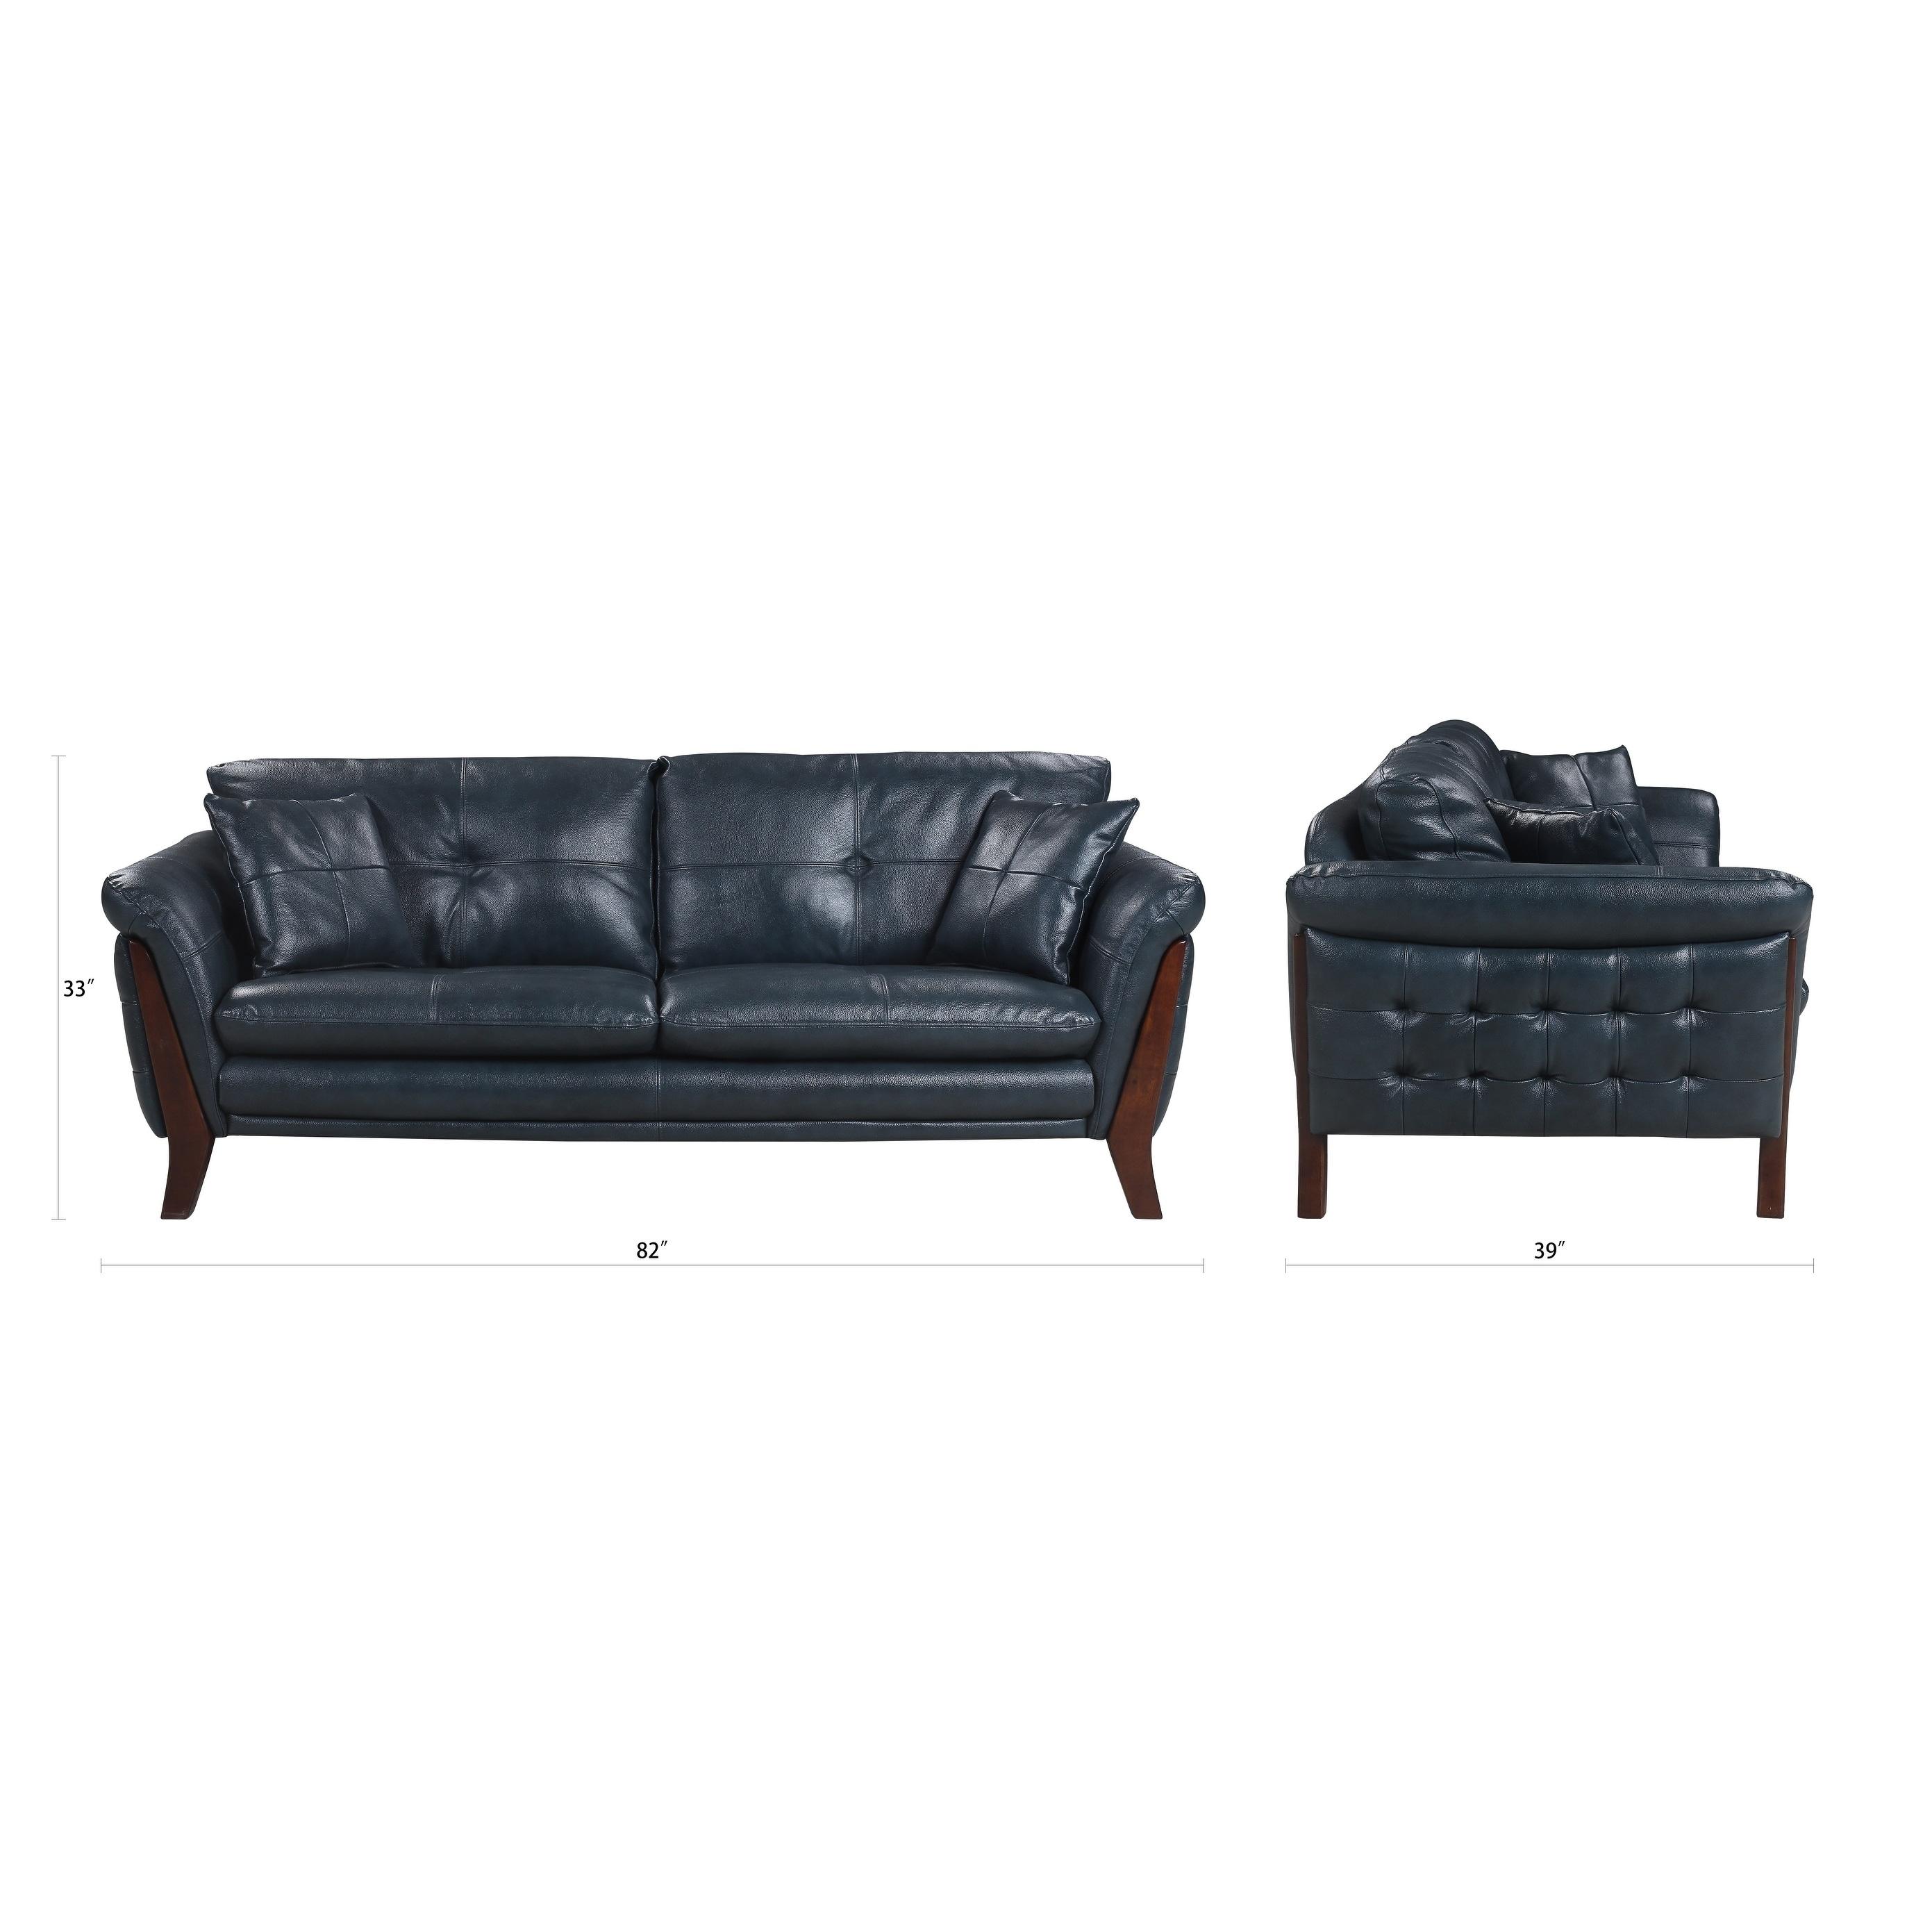 Mid Century Tufted Leather Sofa